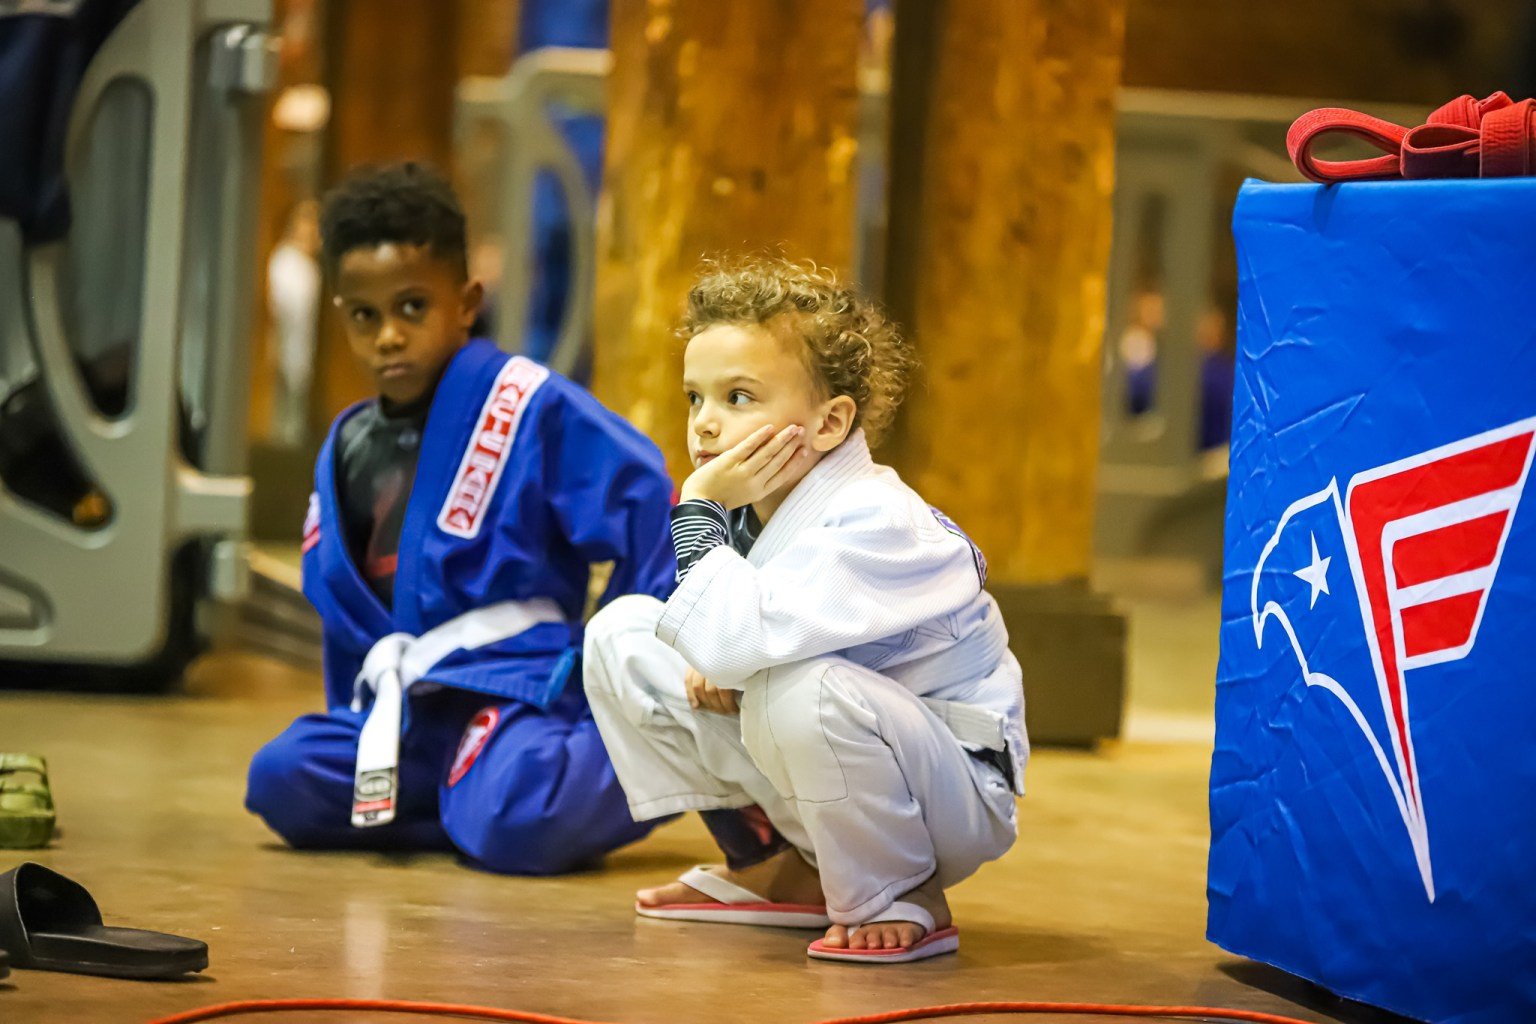 Martial Arts Enterprise, AL